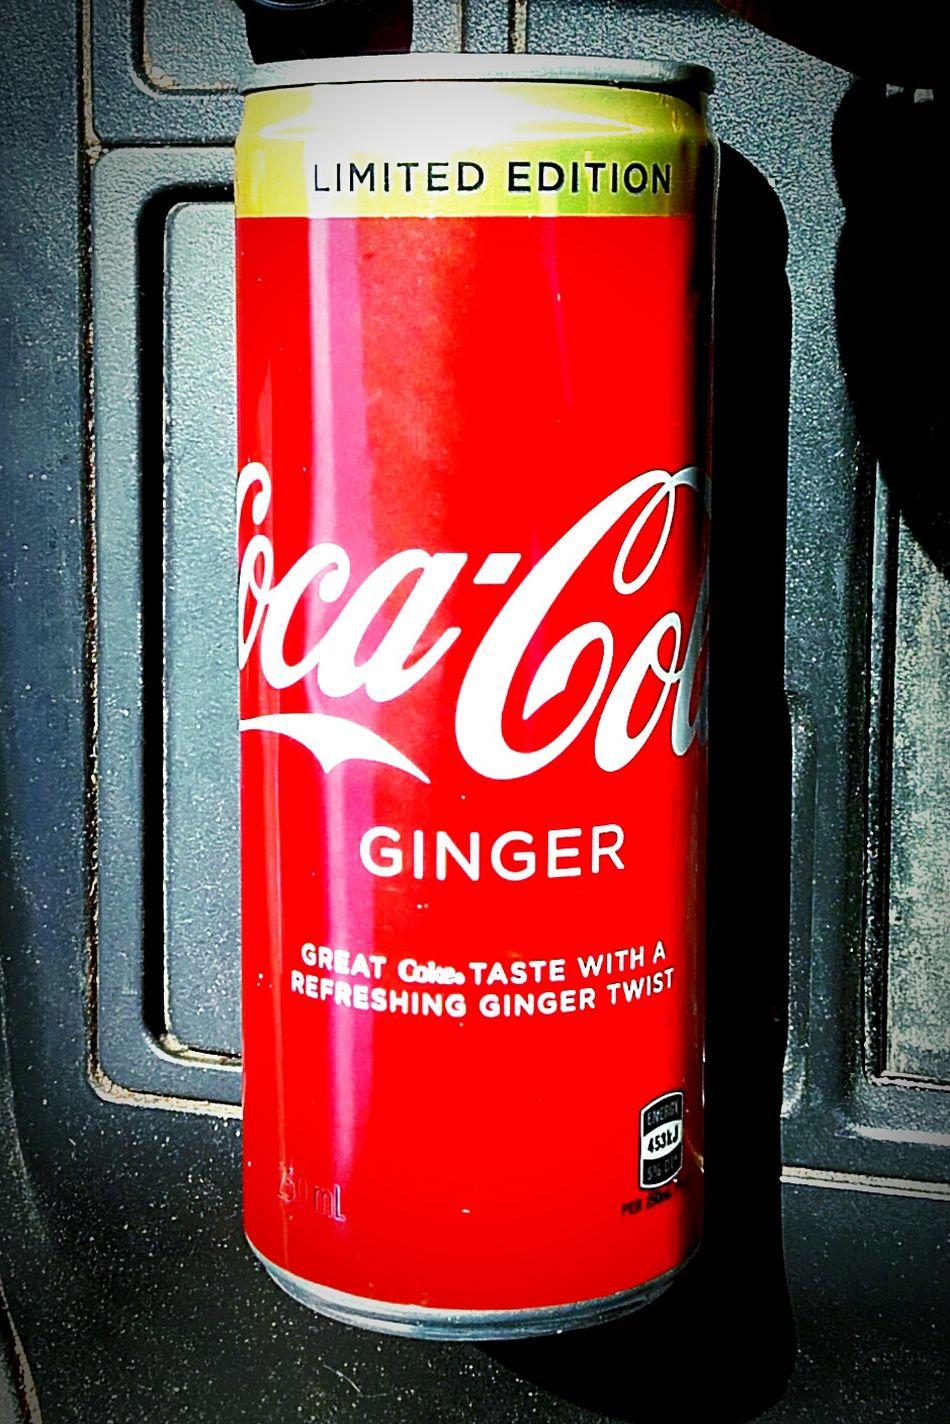 Coke-ginger Coke Ginger Coca-Cola, Logo/label/sign/poster Coca~Cola ® Coca-Cola Ginger Coke Coke :) Coca-cola Coca Cola Coca~cola Coke Can Coke Cans Coca-Cola ❤ Ginger Coke CokeGinger Coca~Cola Labeling Coke Adds Life Limited Edition Limitededition Cola Sodapop Coca-Cola, Label/logo/sign GingerCoke Ginger Coca-Cola Cocacola